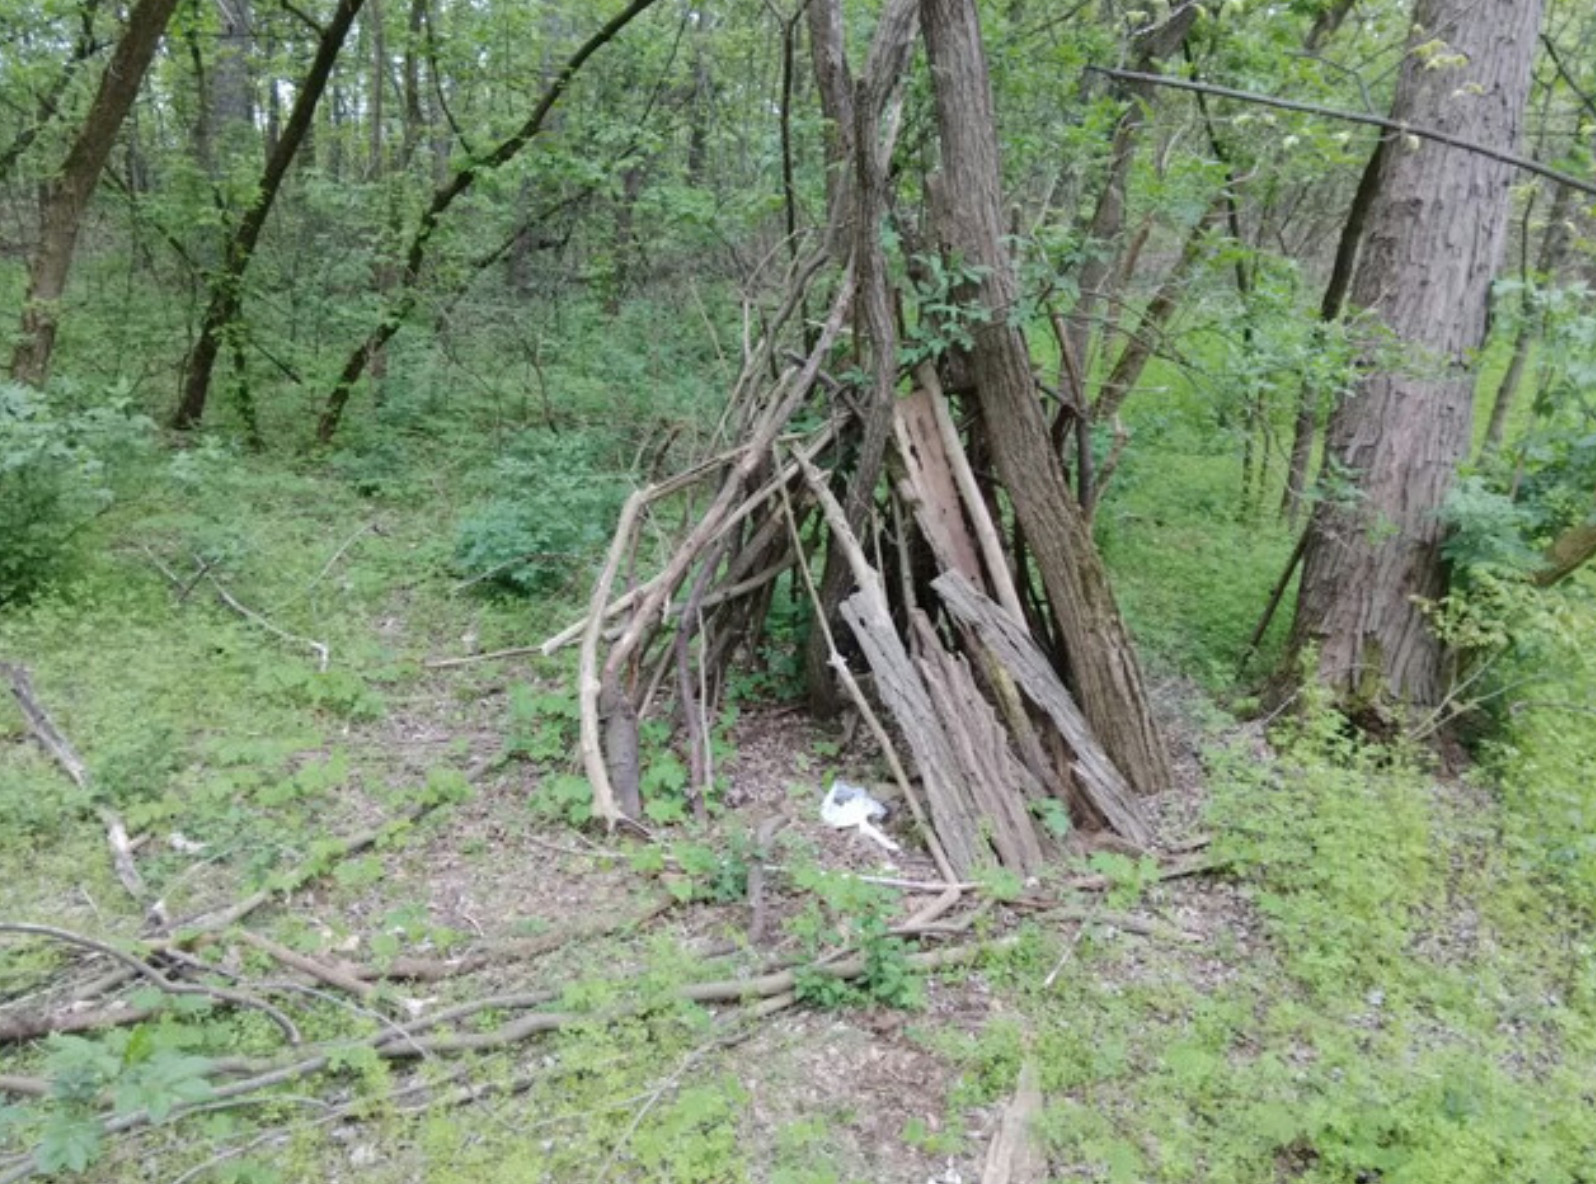 Sasquatch structure